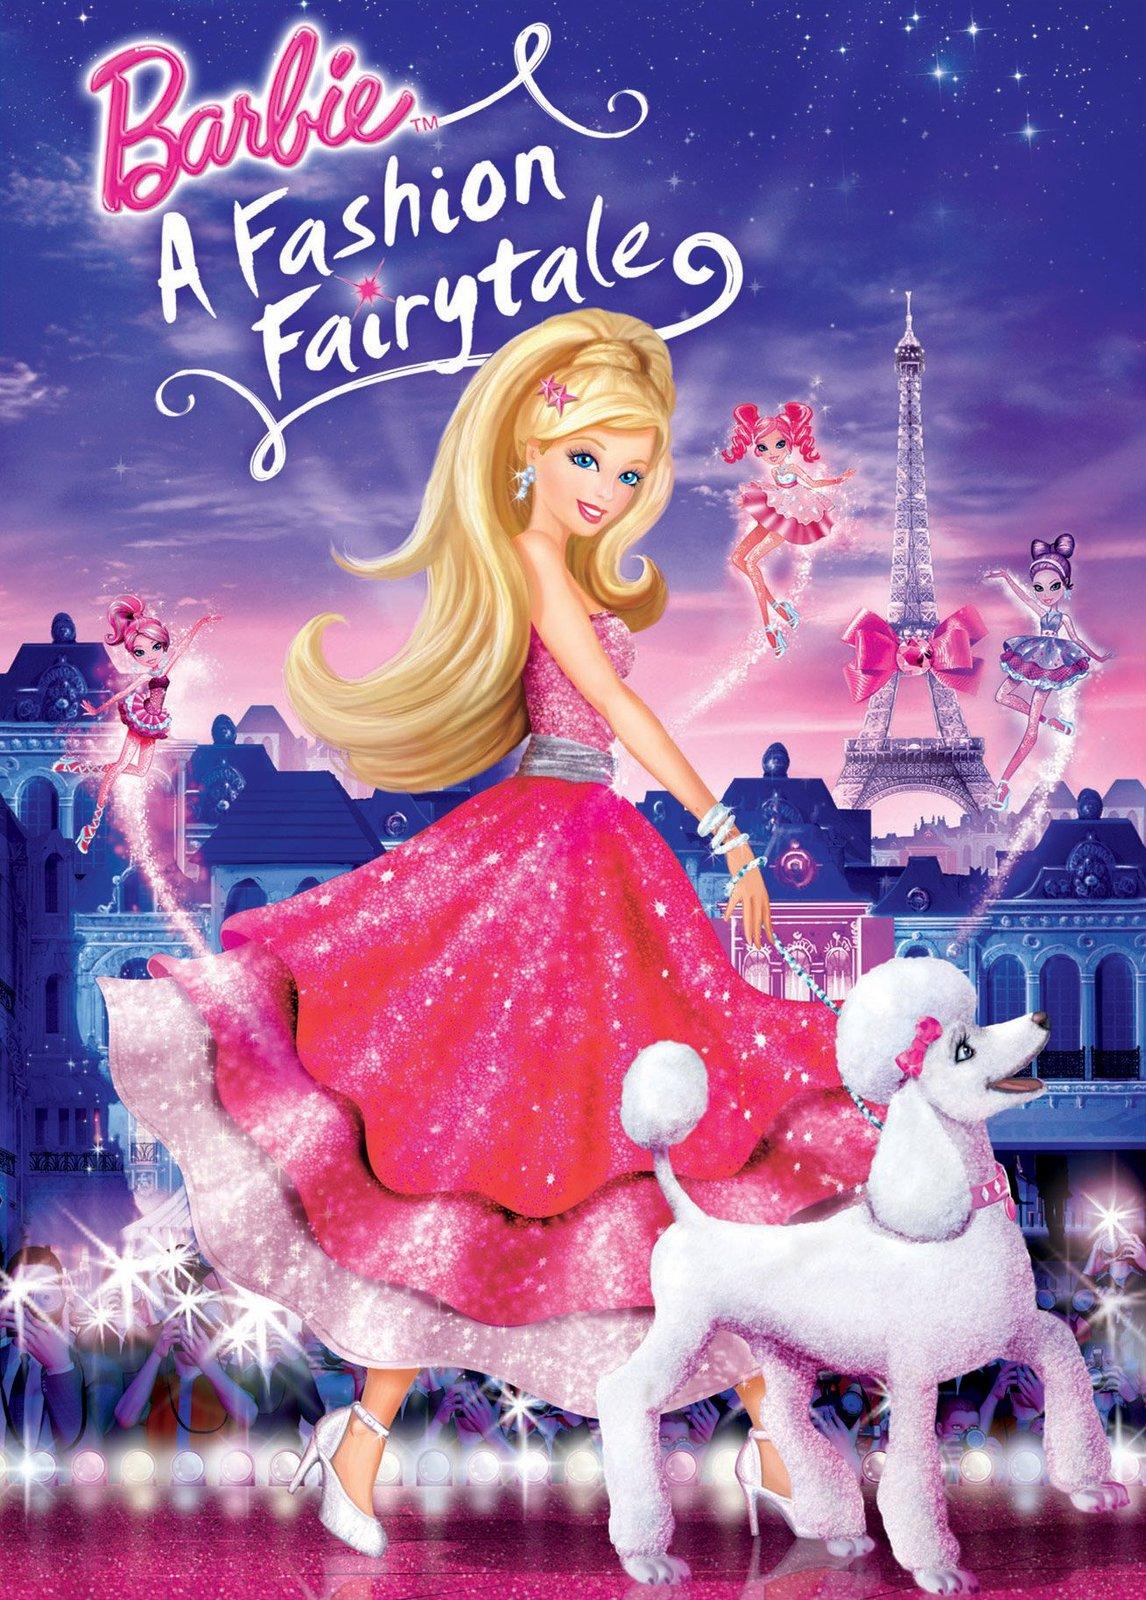 Uncategorized Barbie A Fashion Fairytale image barbie a fashion fairytale cover jpg movies wiki jpg